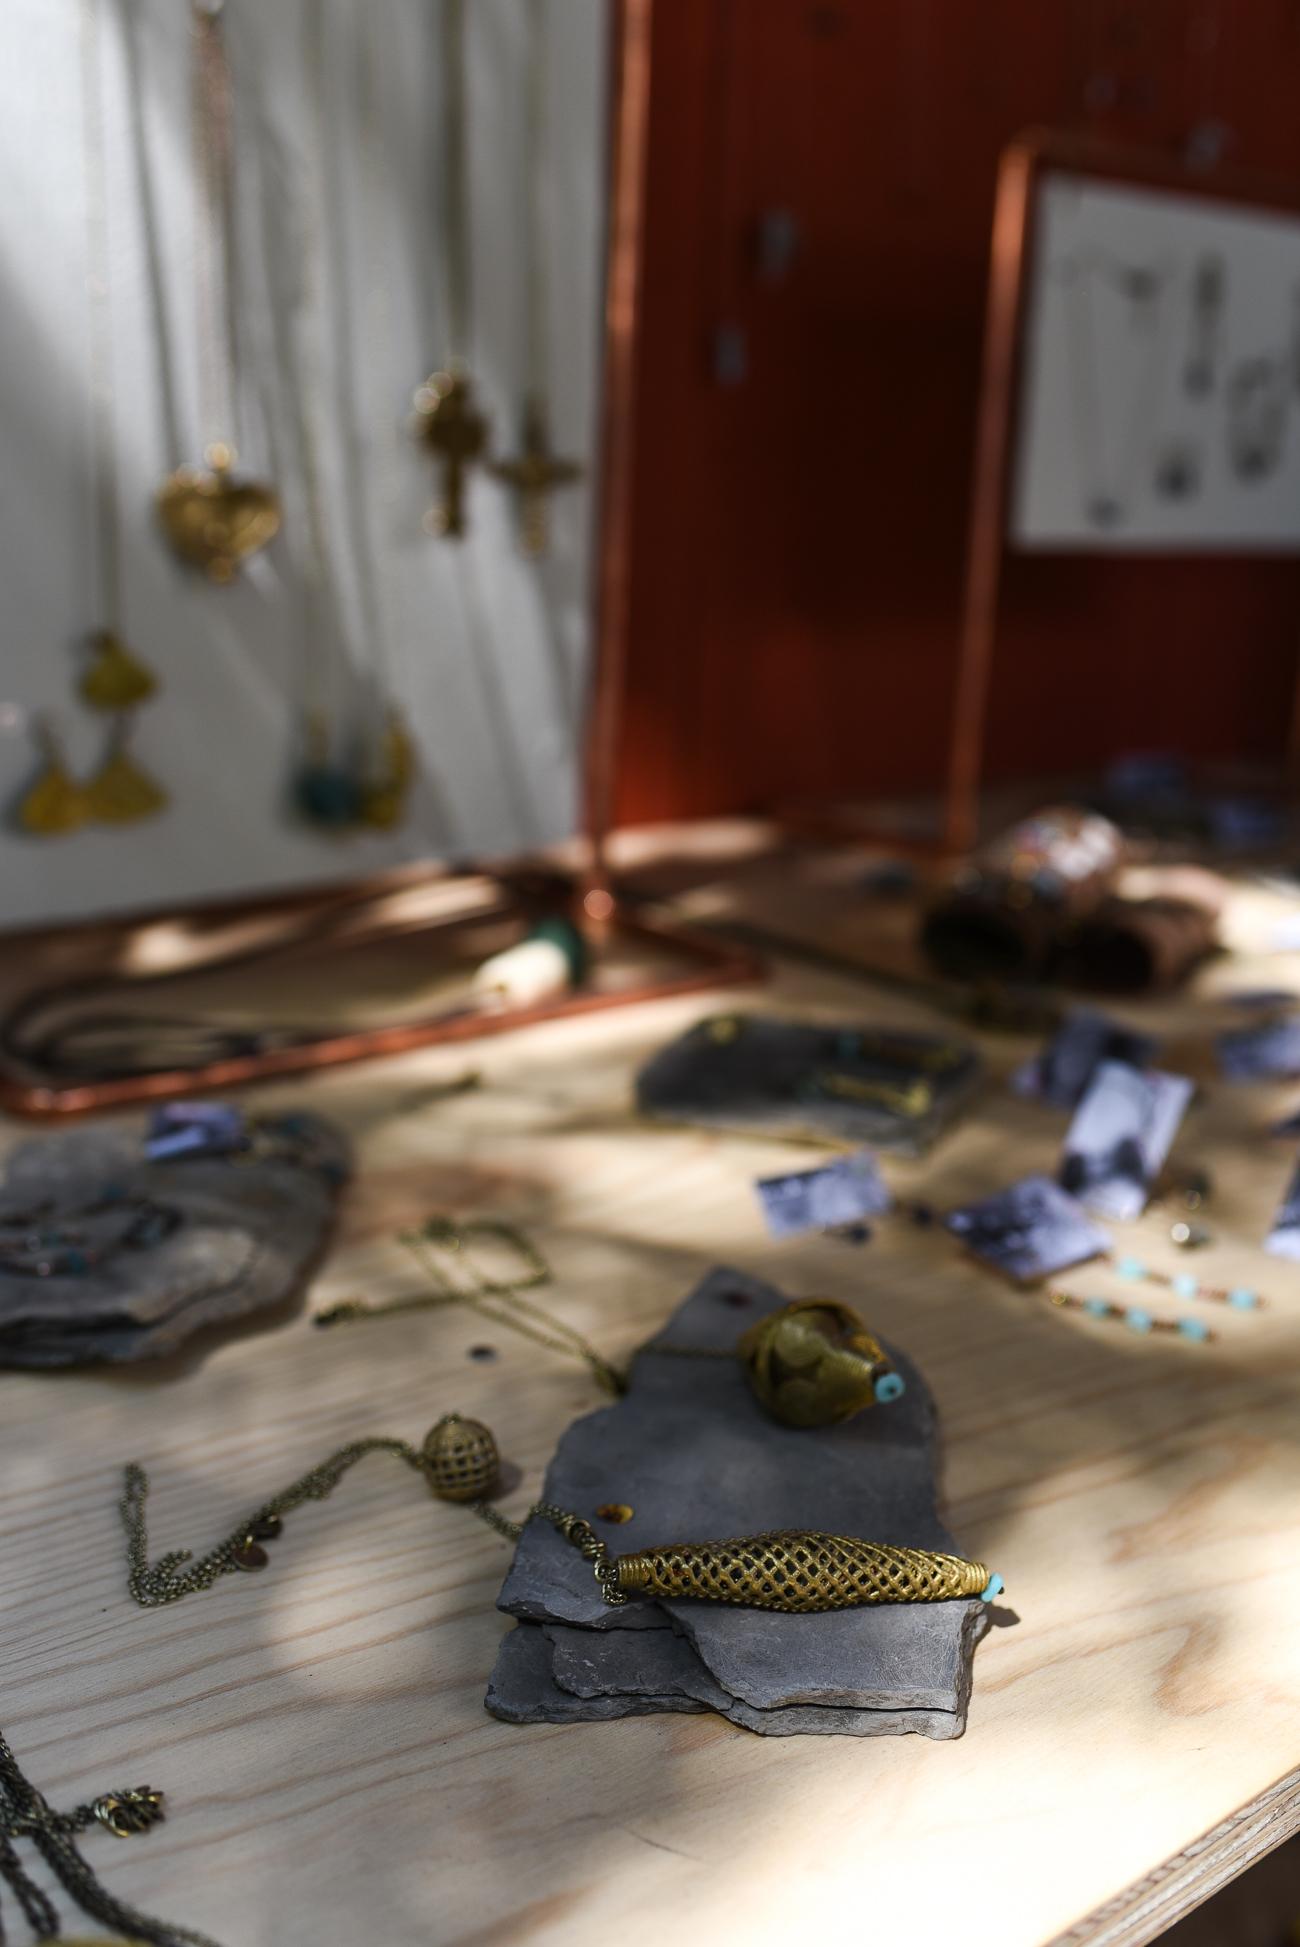 le-studio-twinky-photographe-salon-vivre-cote-sud-2019-aix-en-provence-65.jpg